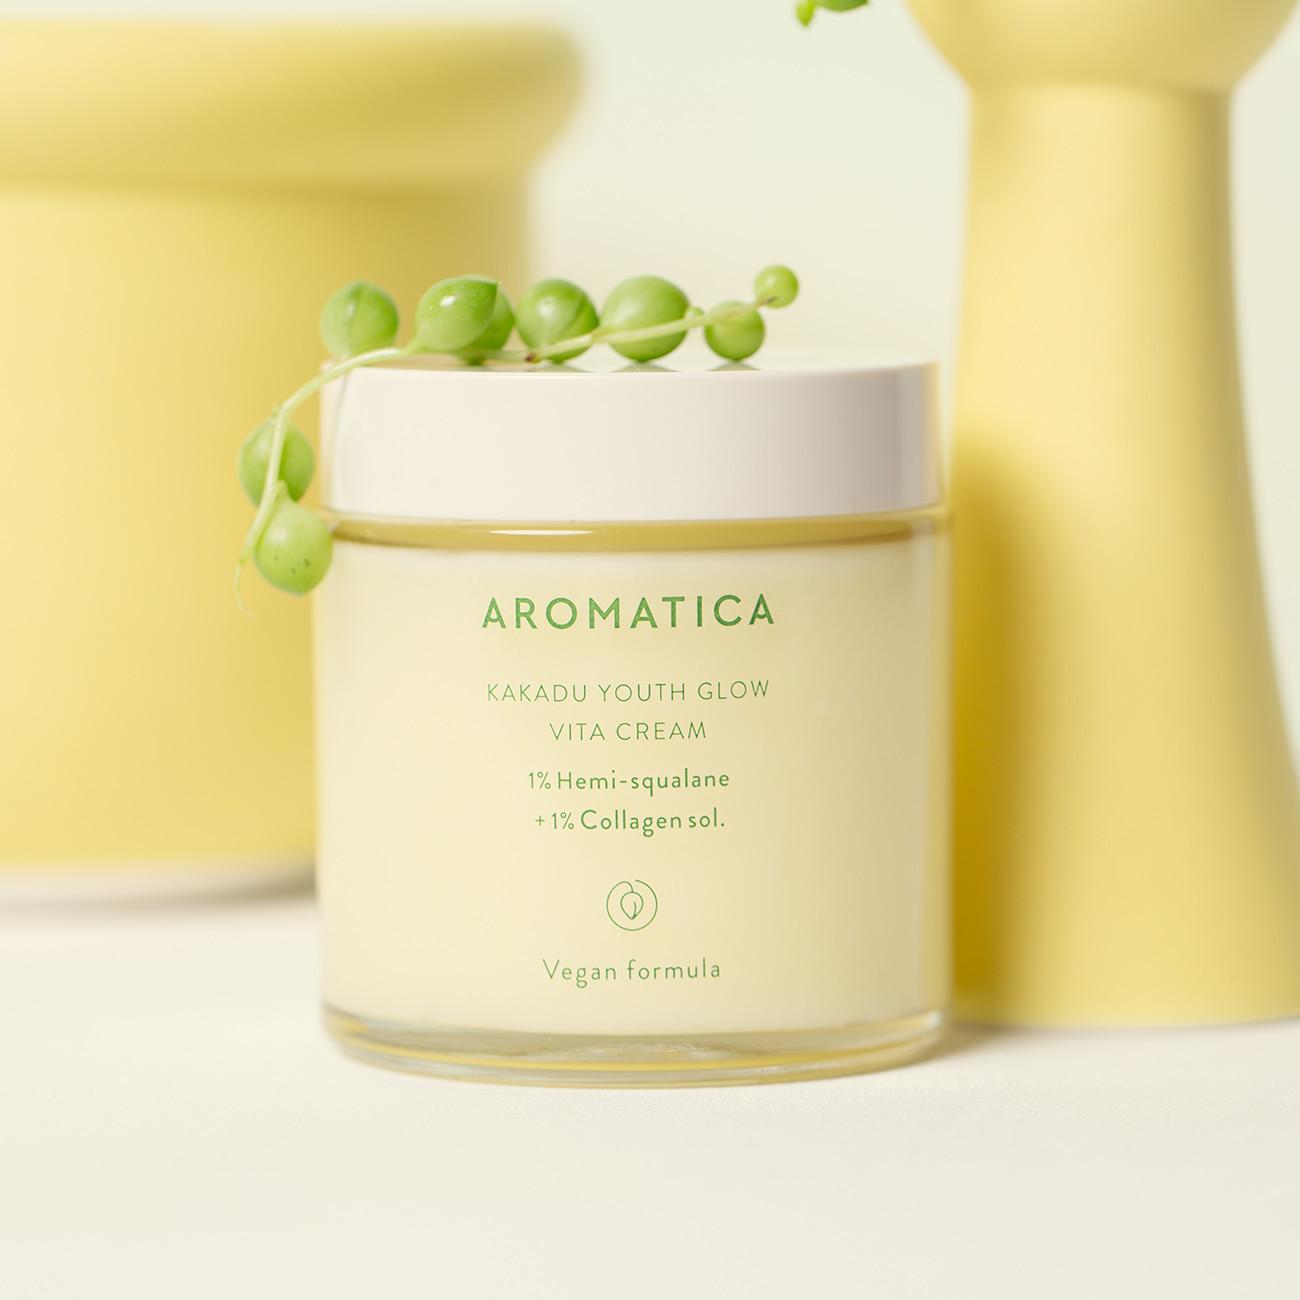 Kakadu Youth Glow Vita Cream1% Hemisqualane + 1% Collagen sol.